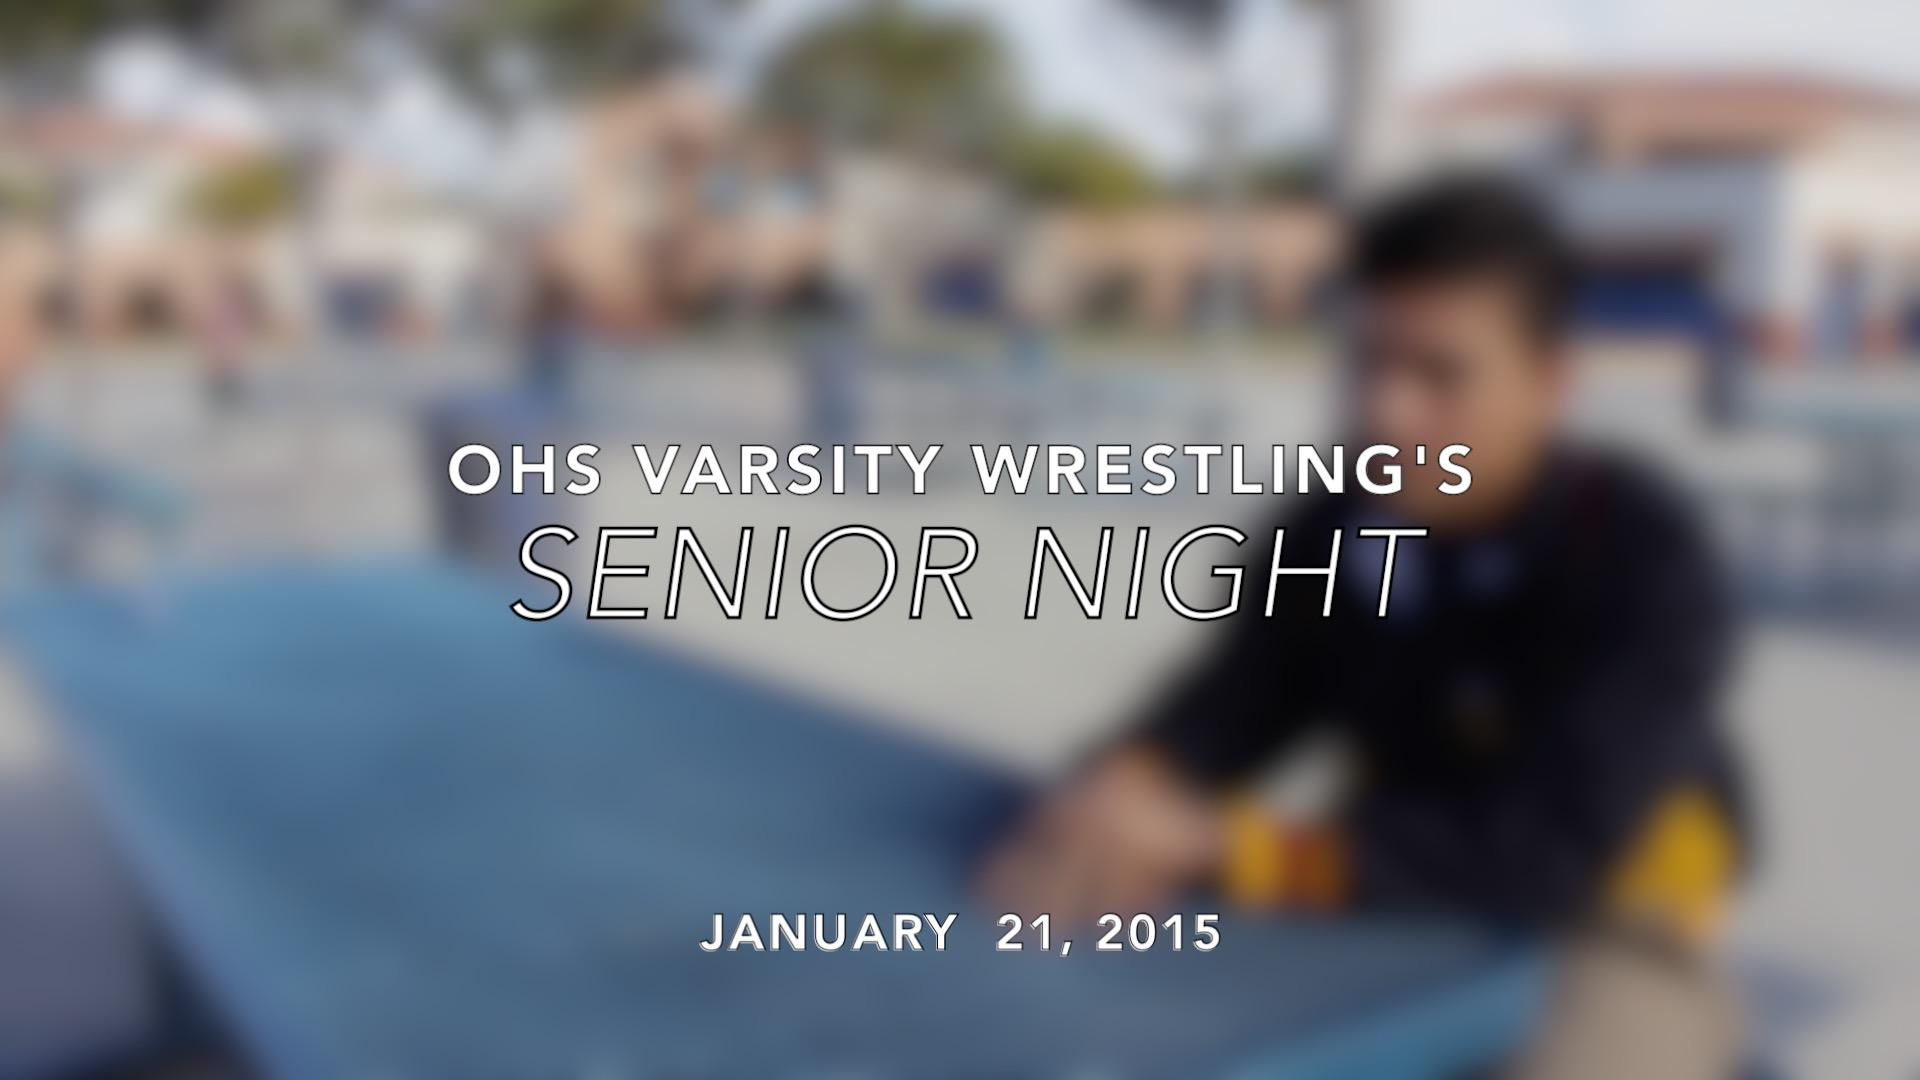 OHS Varsity Wrestling's Senior Night.